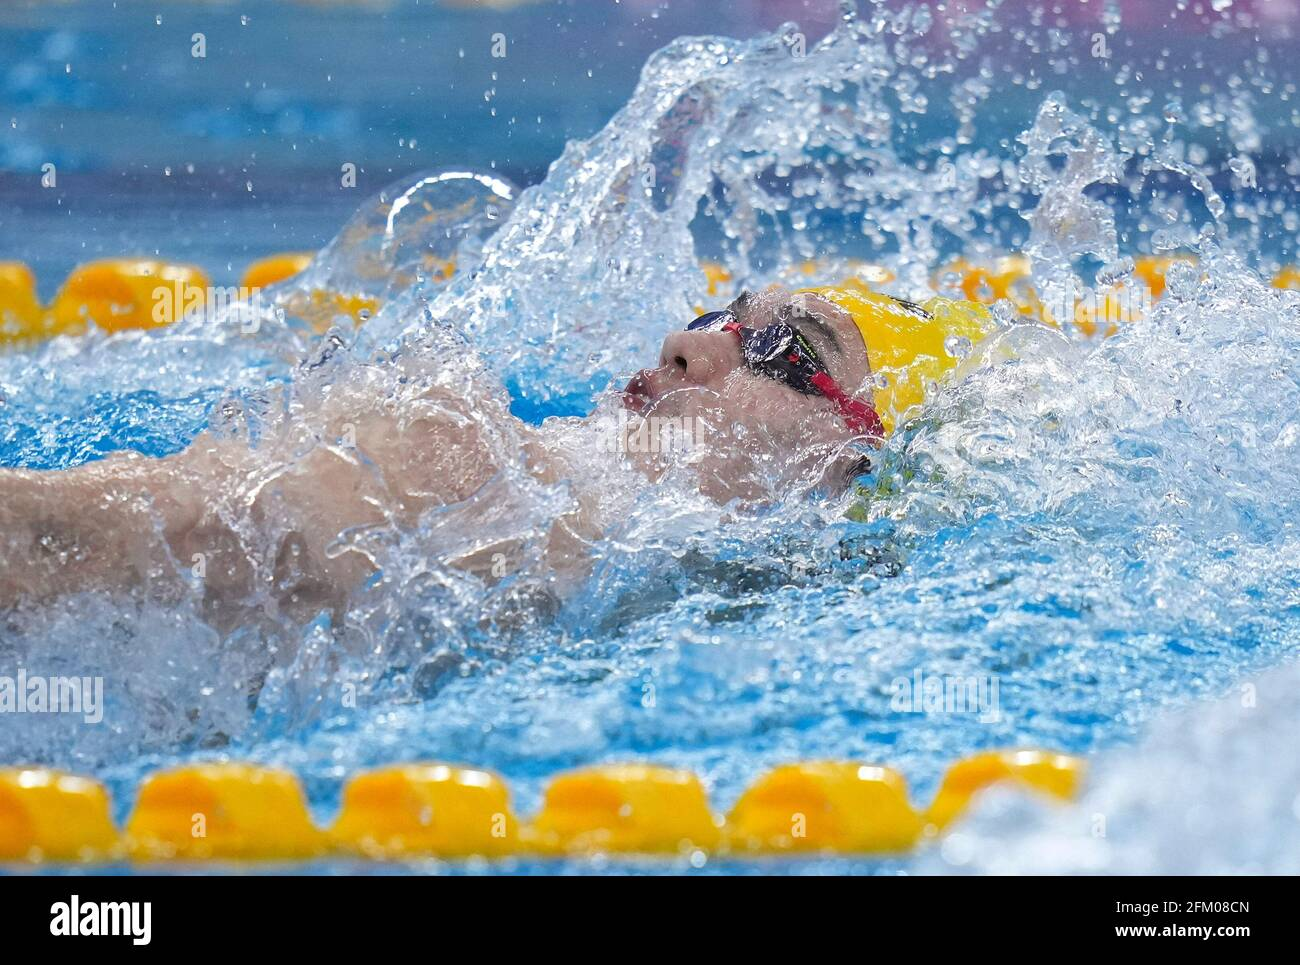 Qingdao, China. 5th May, 2021. Xu Jiayu of Zhejiang competes during the men's 200m backstroke semifinal at the 2021 Chinese National Swimming Championships in Qingdao, east China, May 5, 2021. Credit: Xu Chang/Xinhua/Alamy Live News Stock Photo